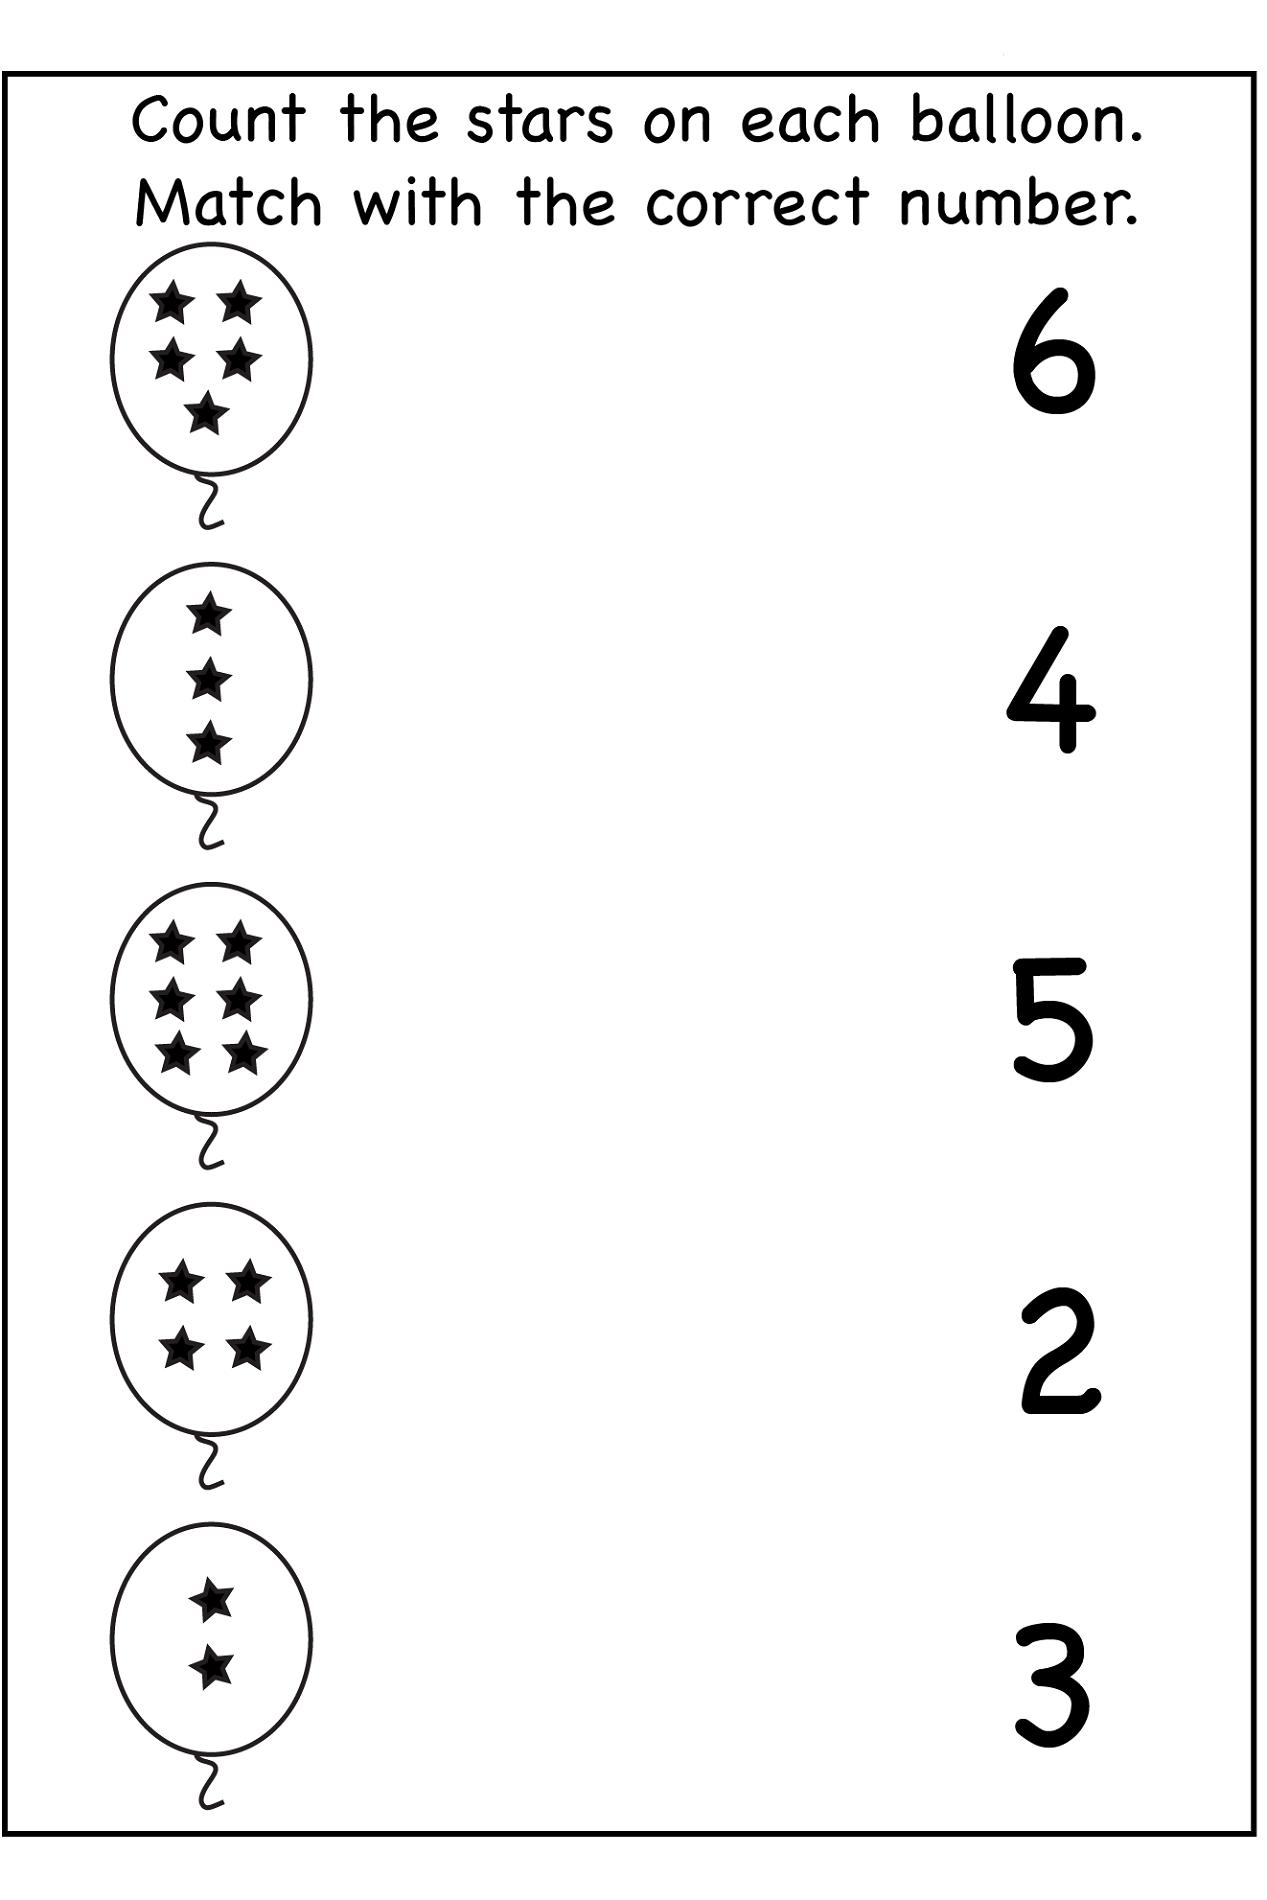 medium resolution of pre-k worksheets - Yahoo Image Search Results   Preschool math worksheets